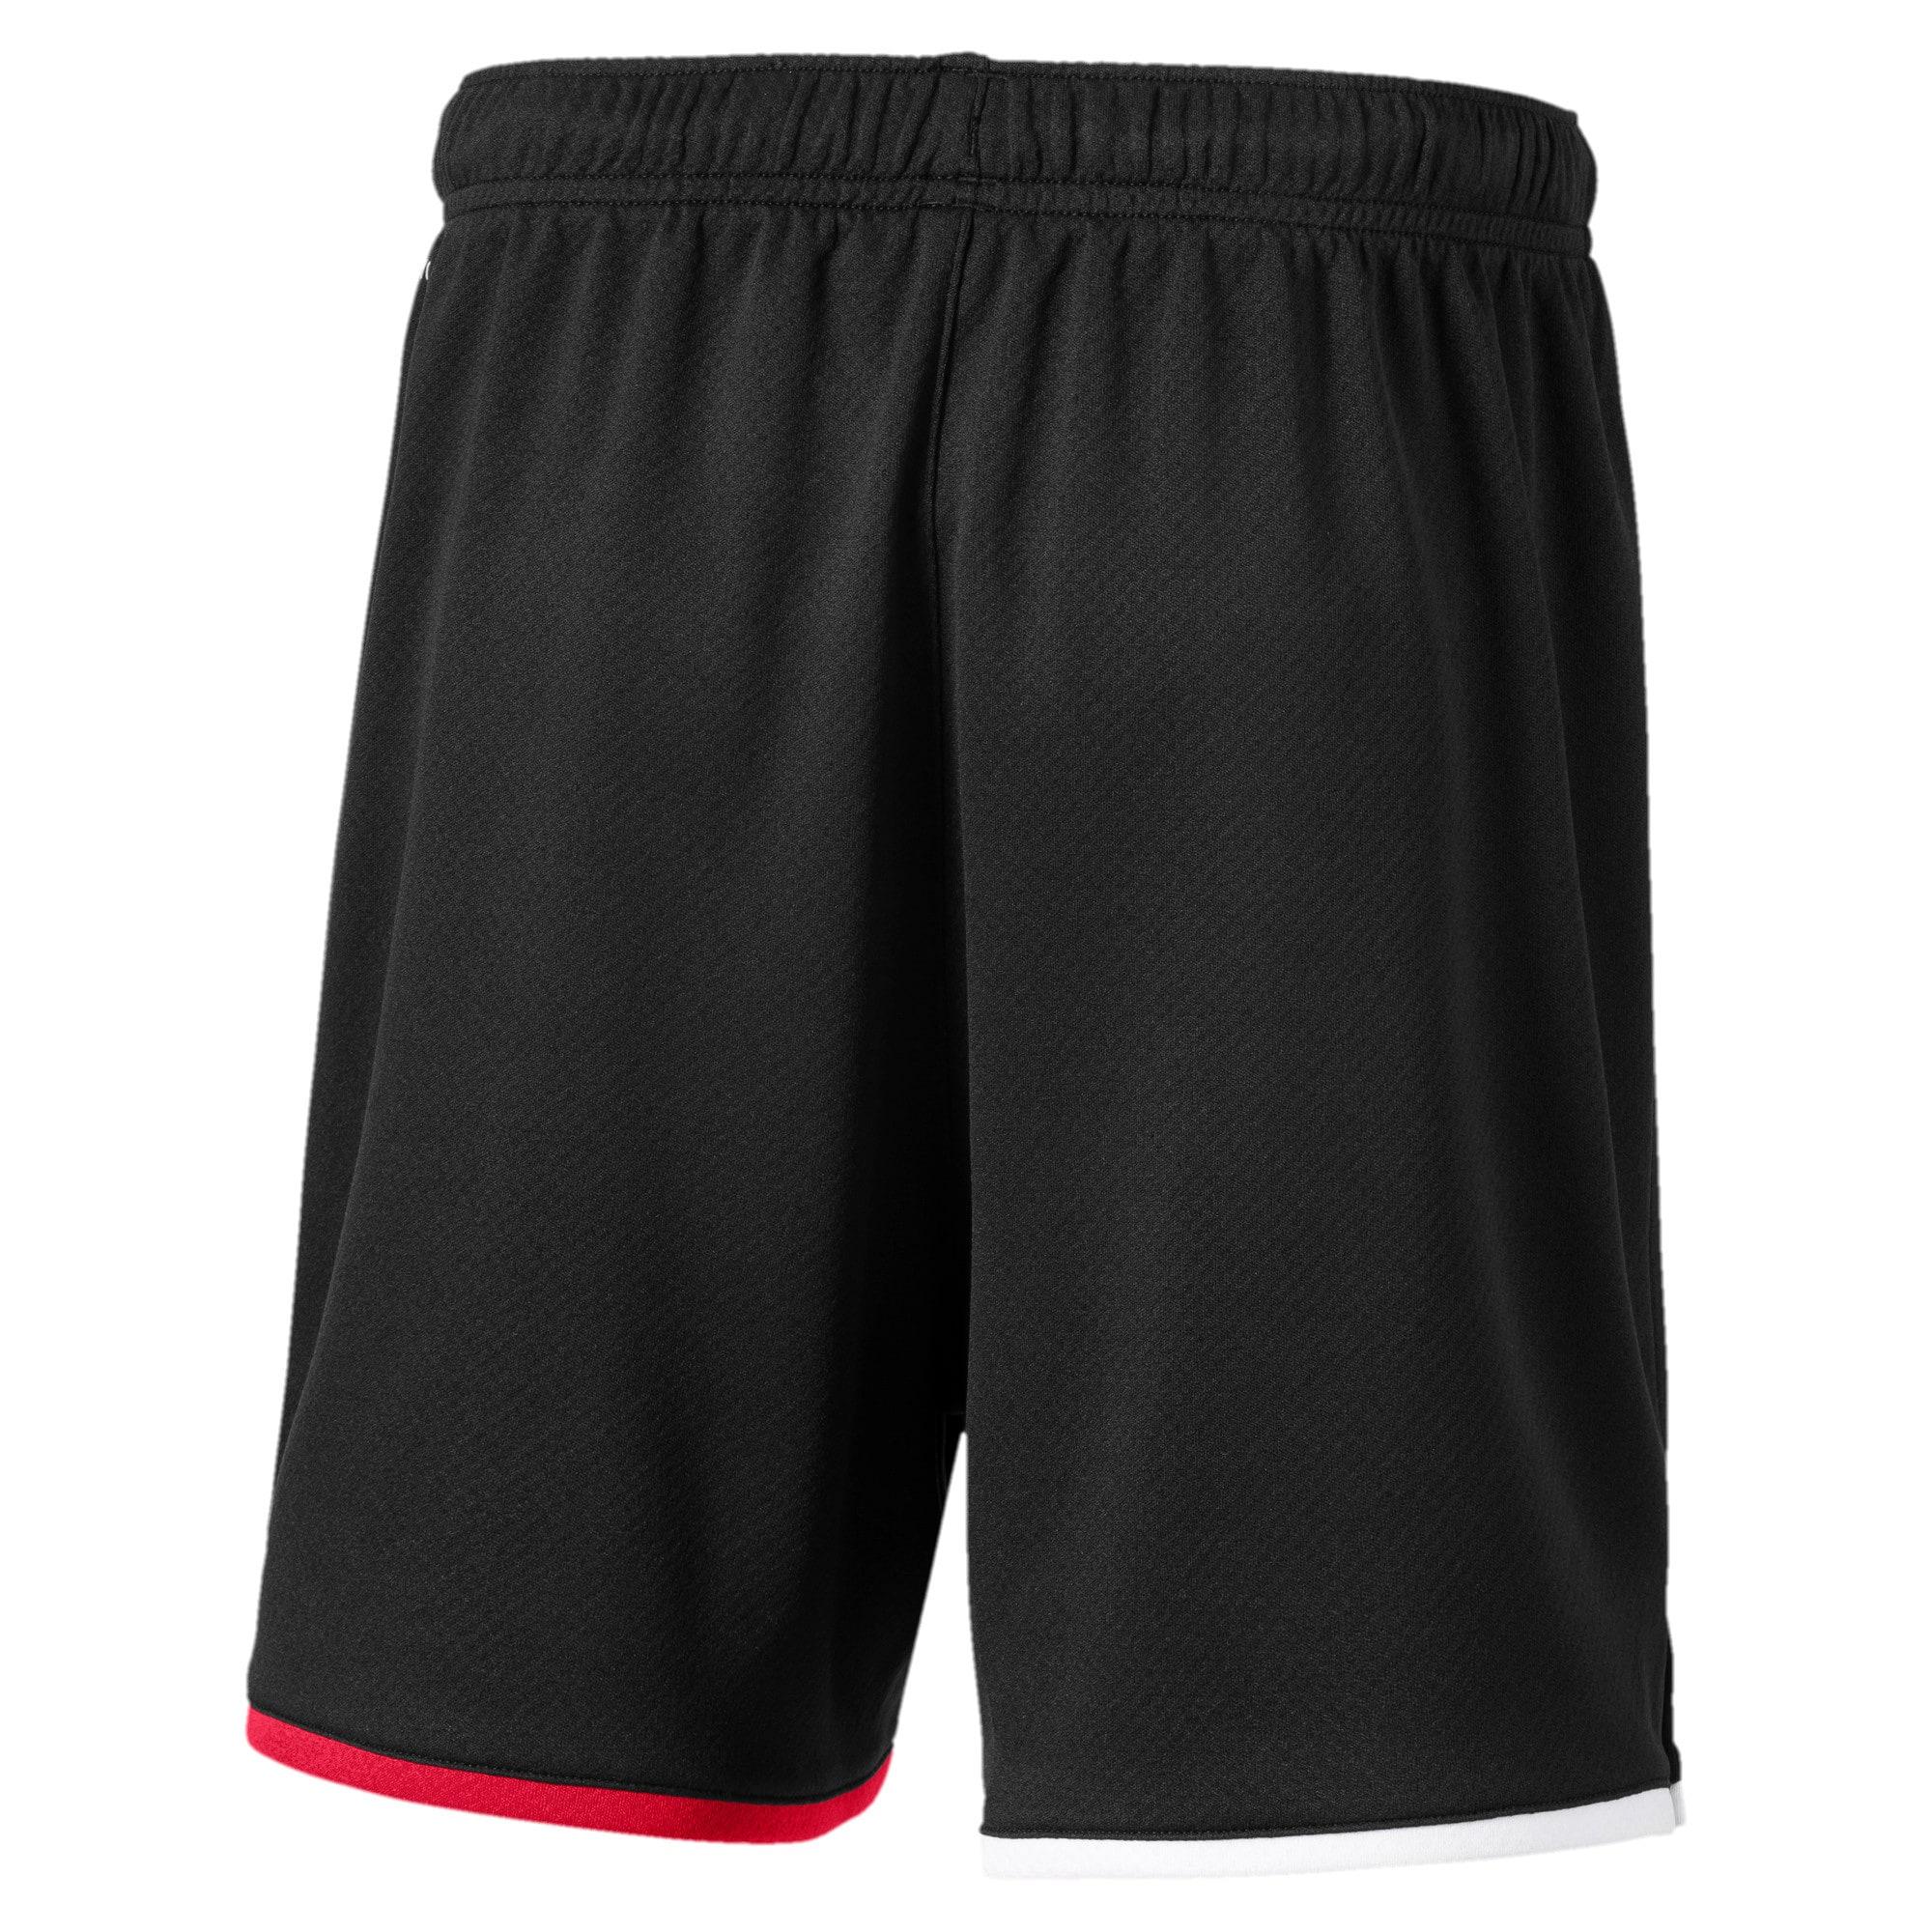 Thumbnail 2 of AC Milan Replica Kids' Shorts, Puma Black-Tango Red, medium